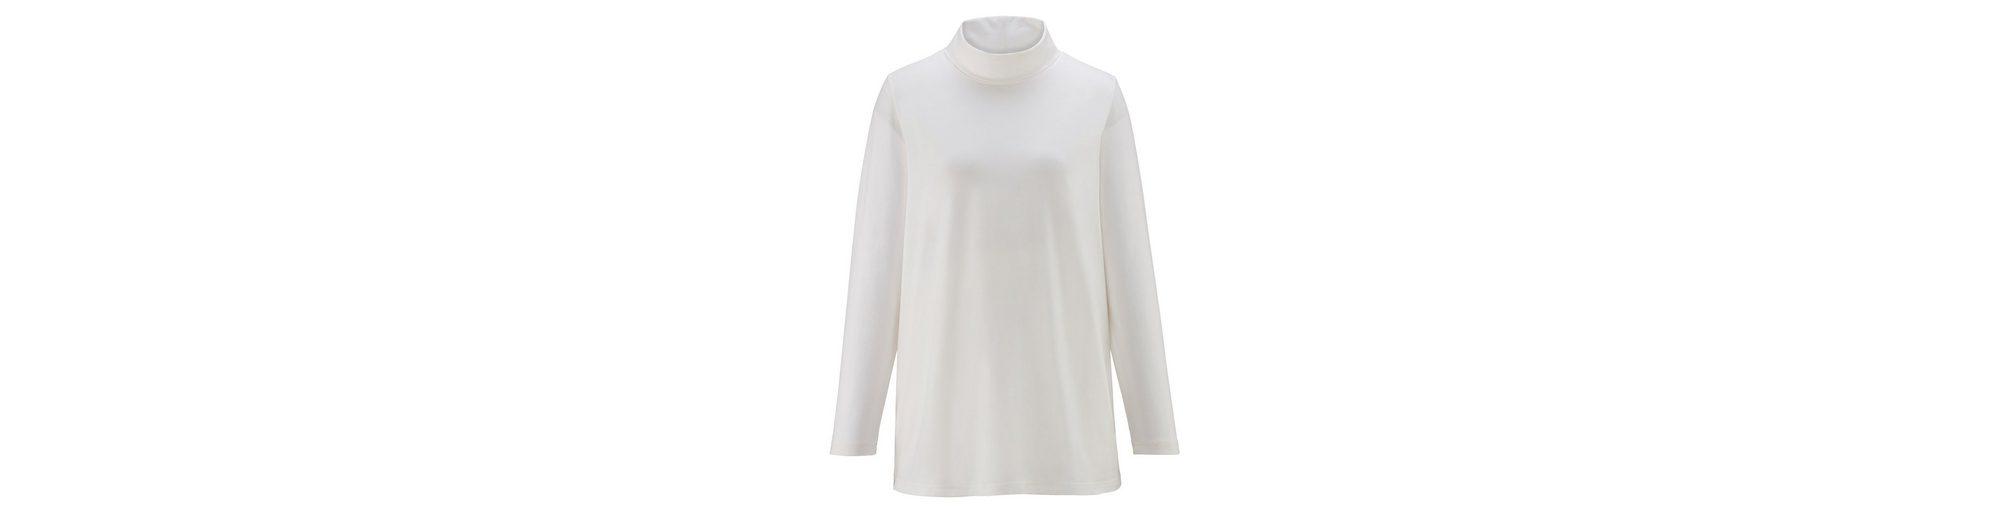 Single mit Shirt MIAMODA Shirt aus Rollkragen Jersey MIAMODA Rt1w7qwY